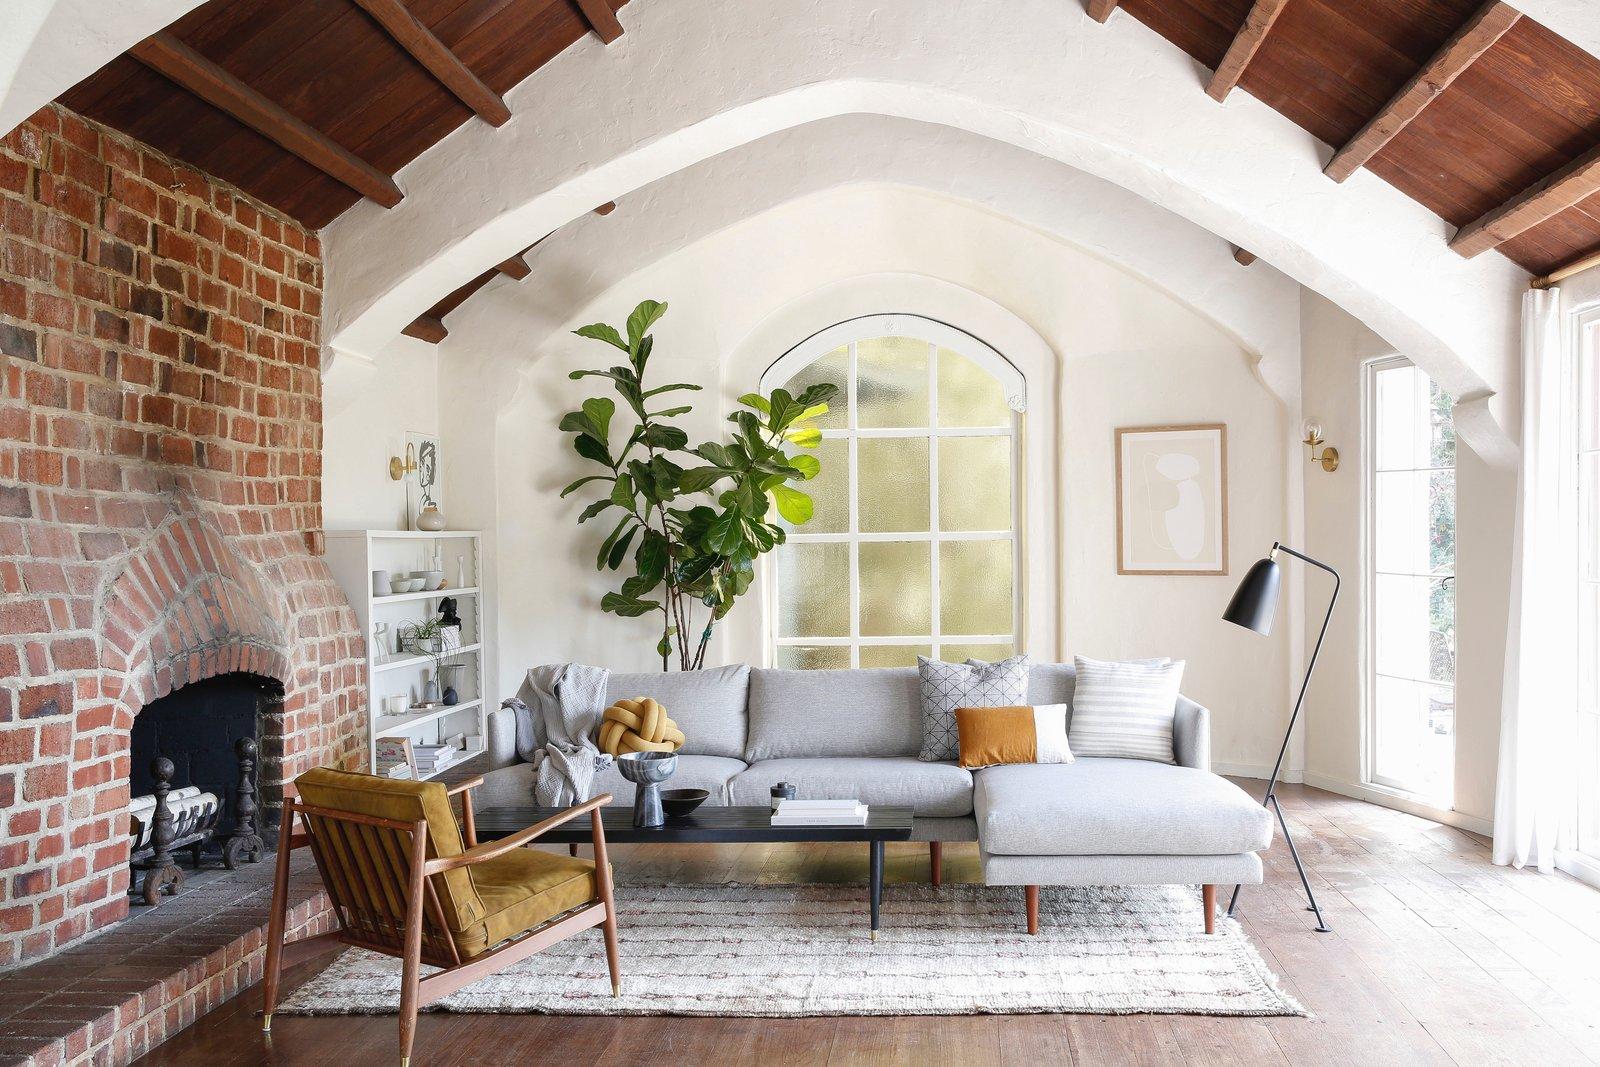 My House: Visual Strategist Kate Davison's Chic Bay Area Abode